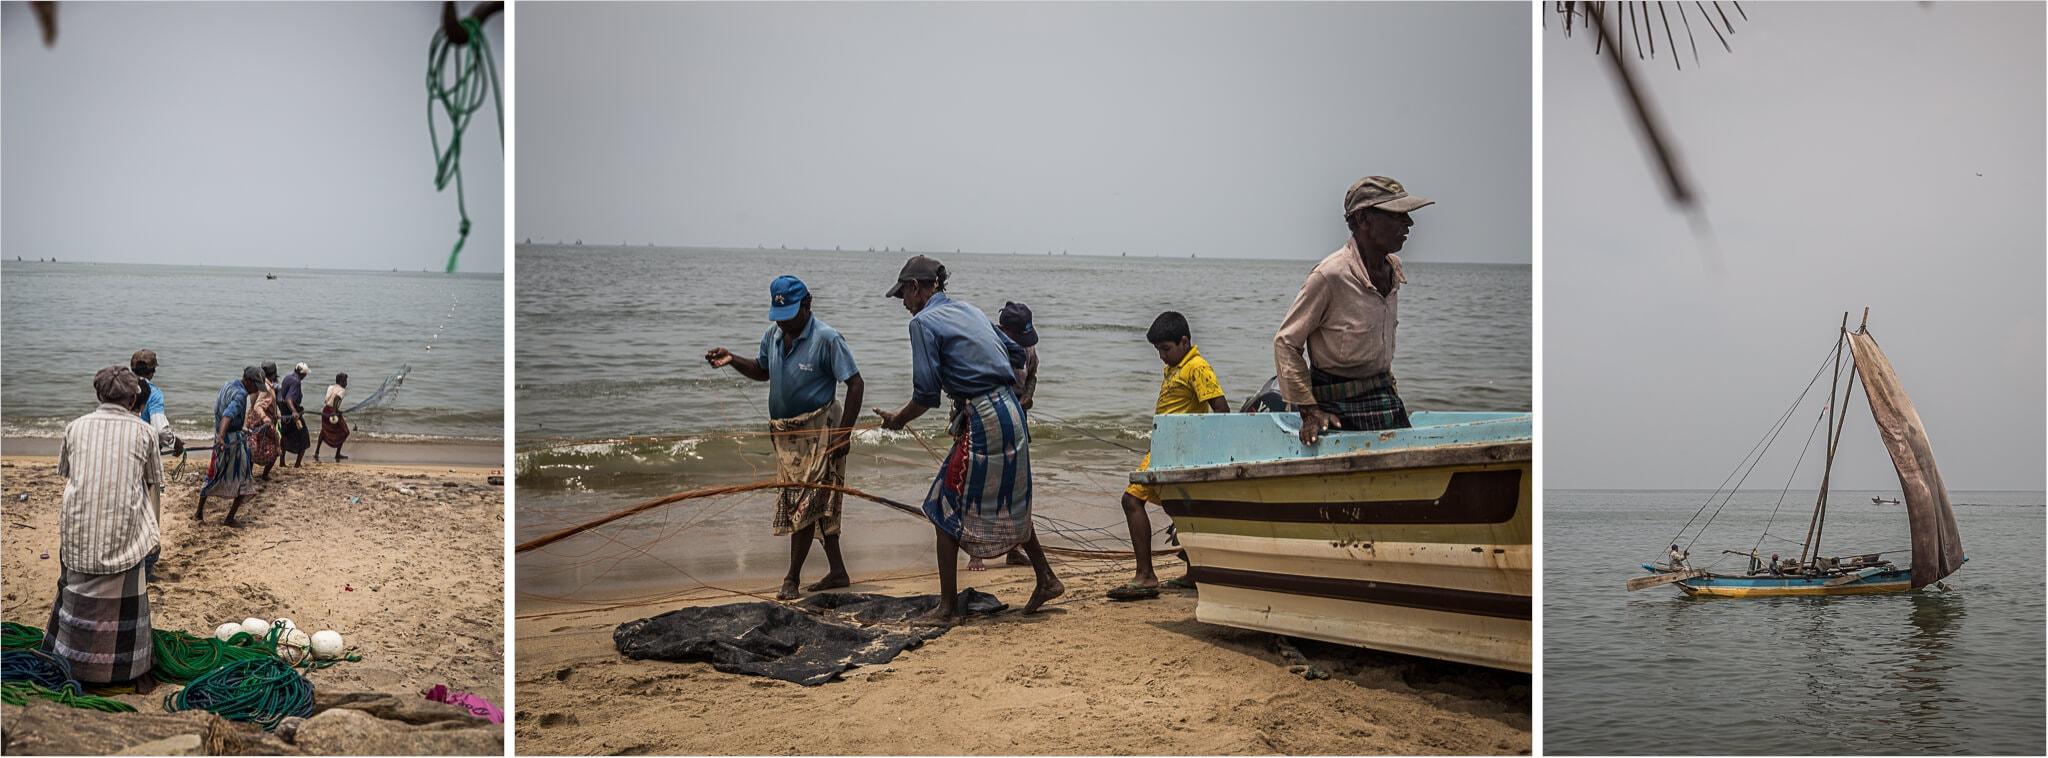 Fischer in Negombo am Strand